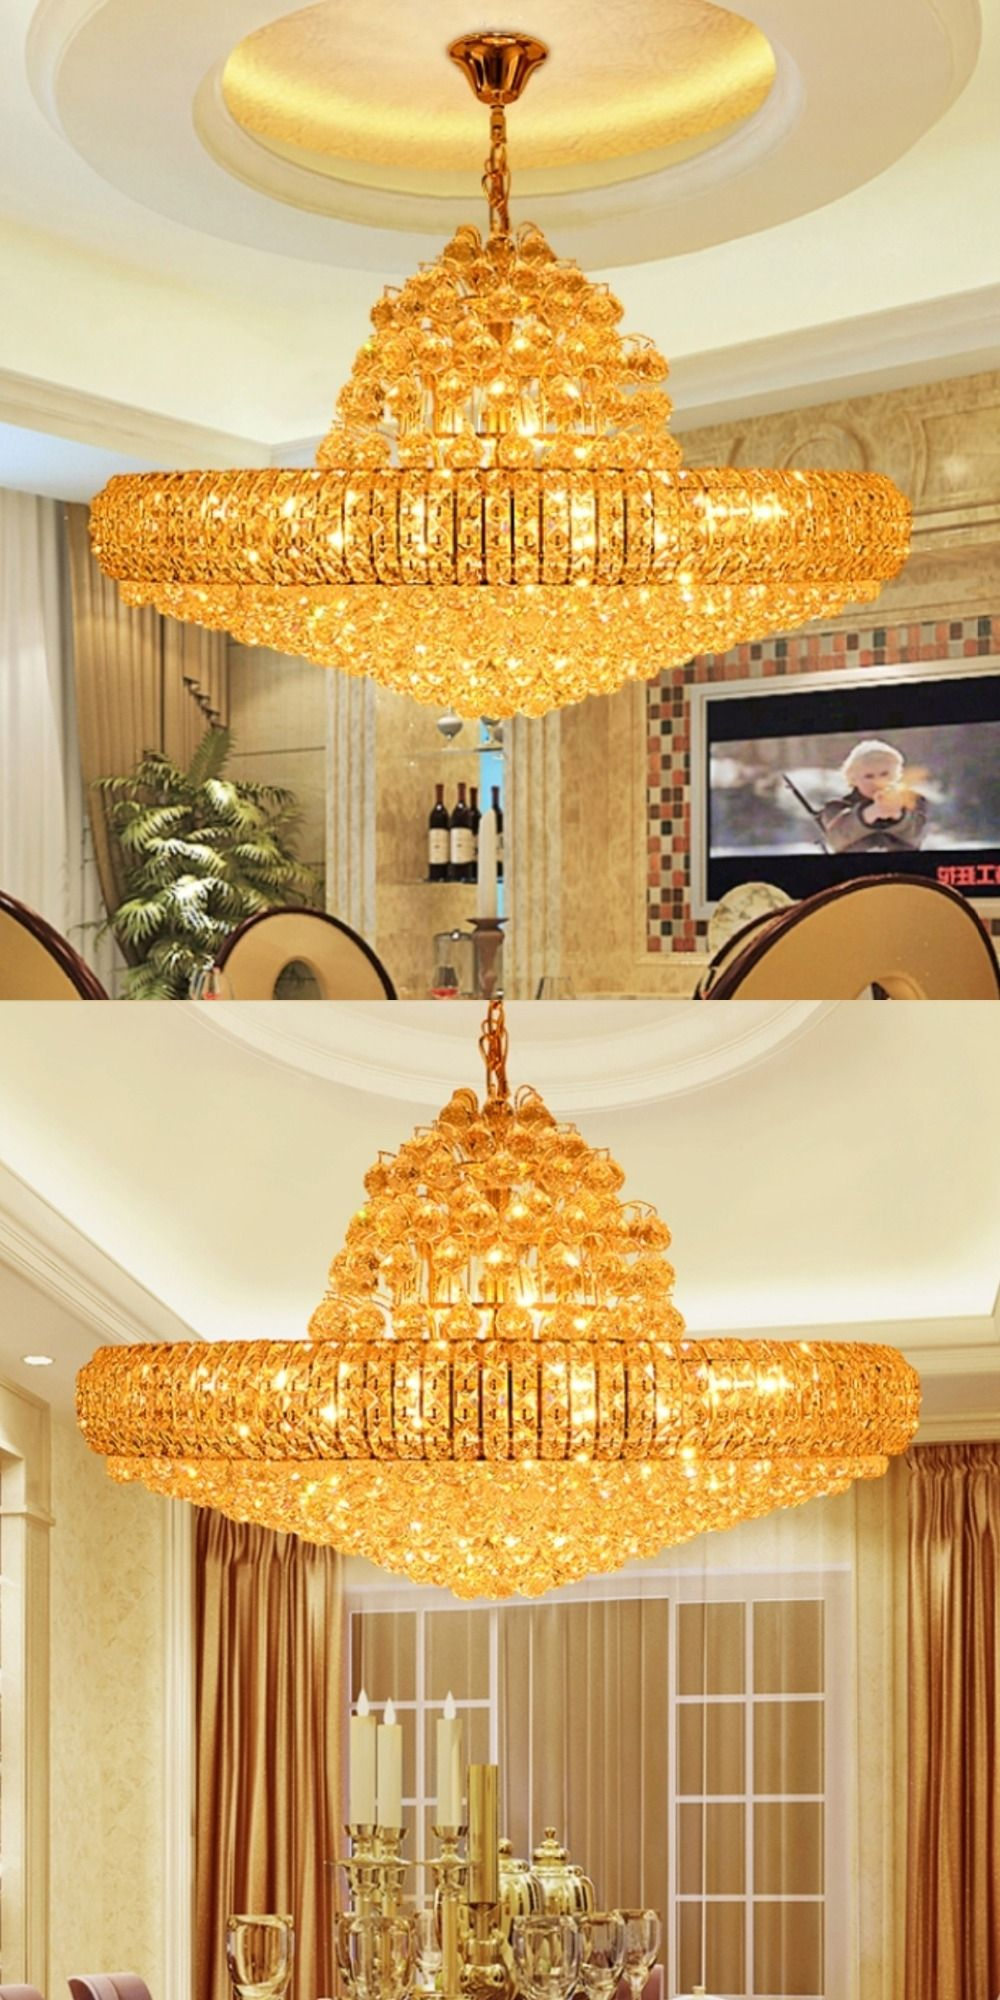 Led Modern Golden K9 Crystal Chandelier Big Round Gold Chandeliers Lights Fixture Hotel Club